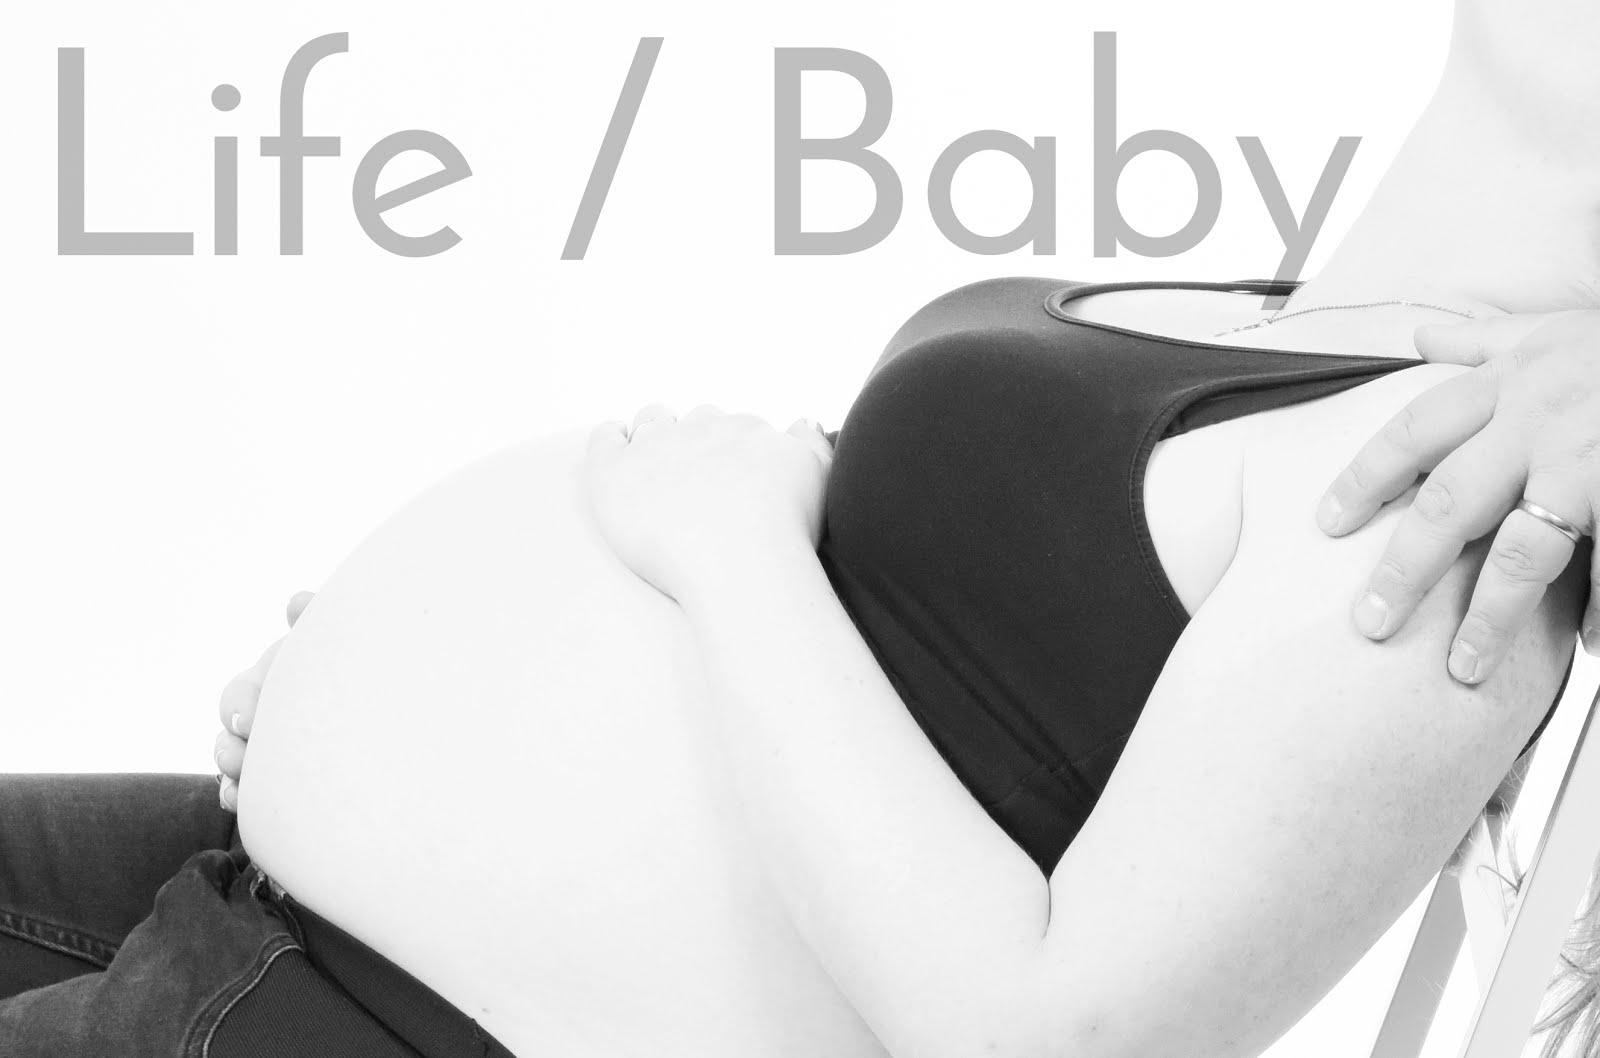 Life / Baby